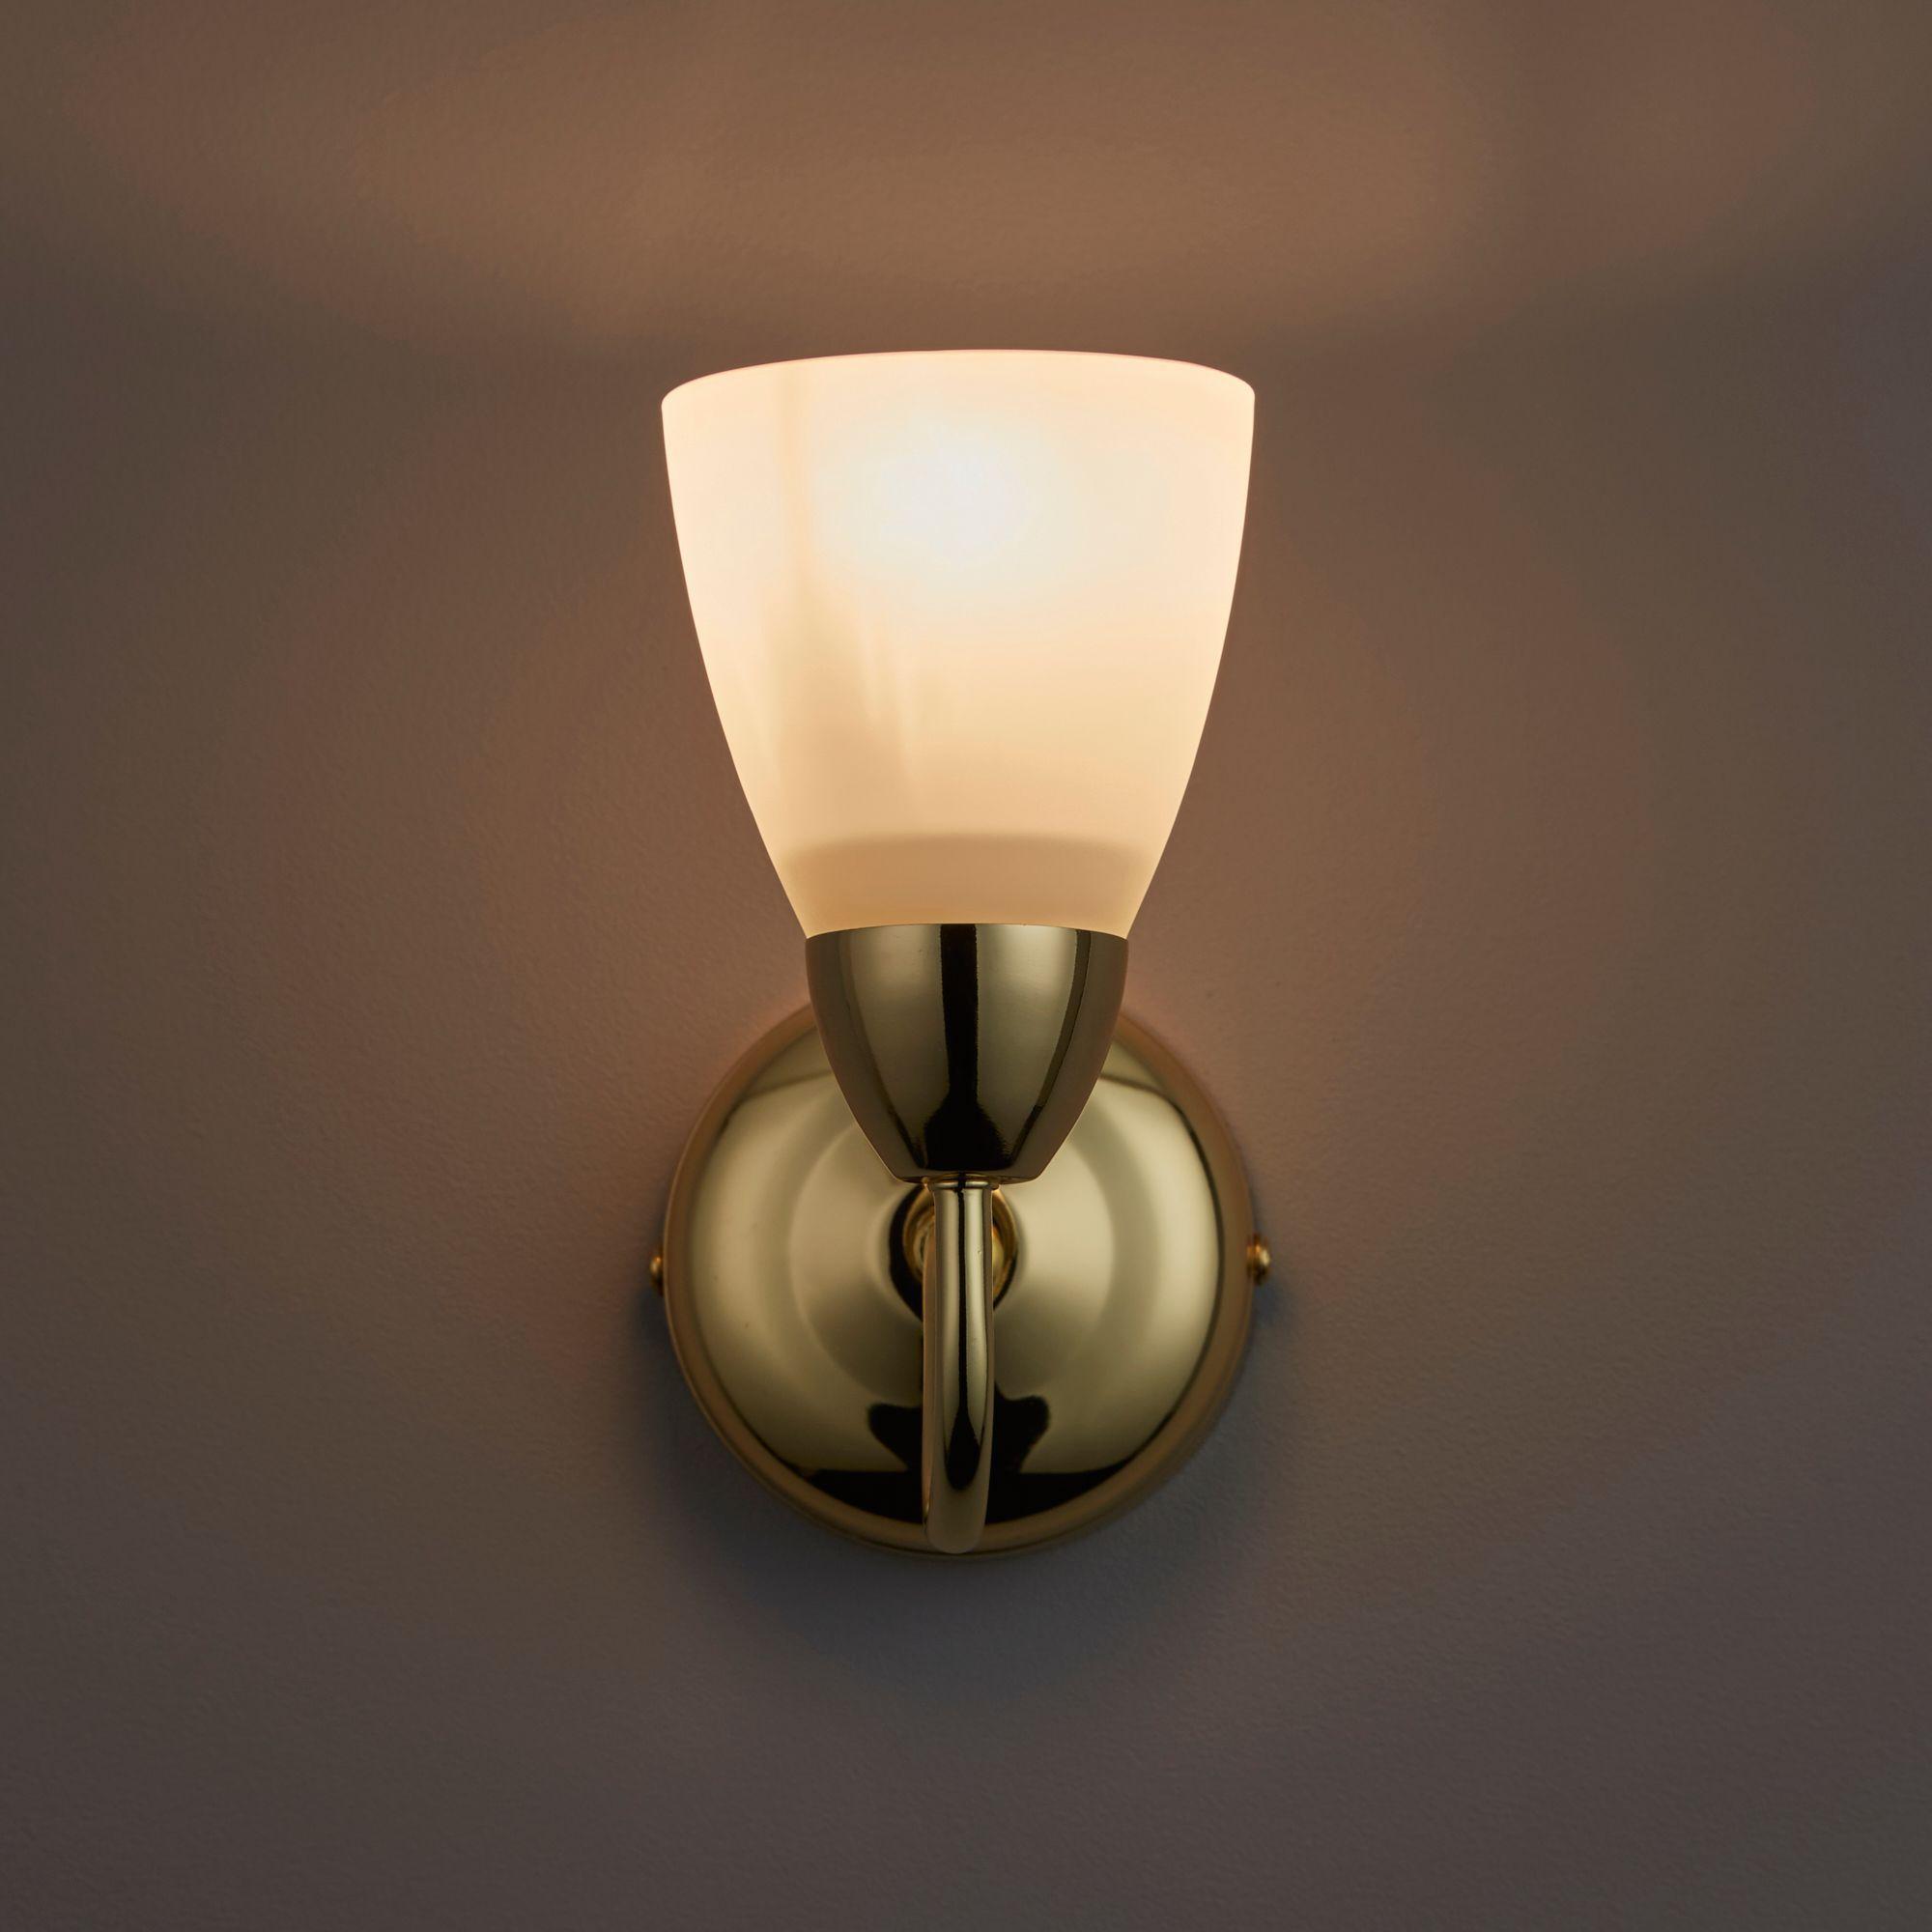 Virgo Brass Effect Single Wall Light